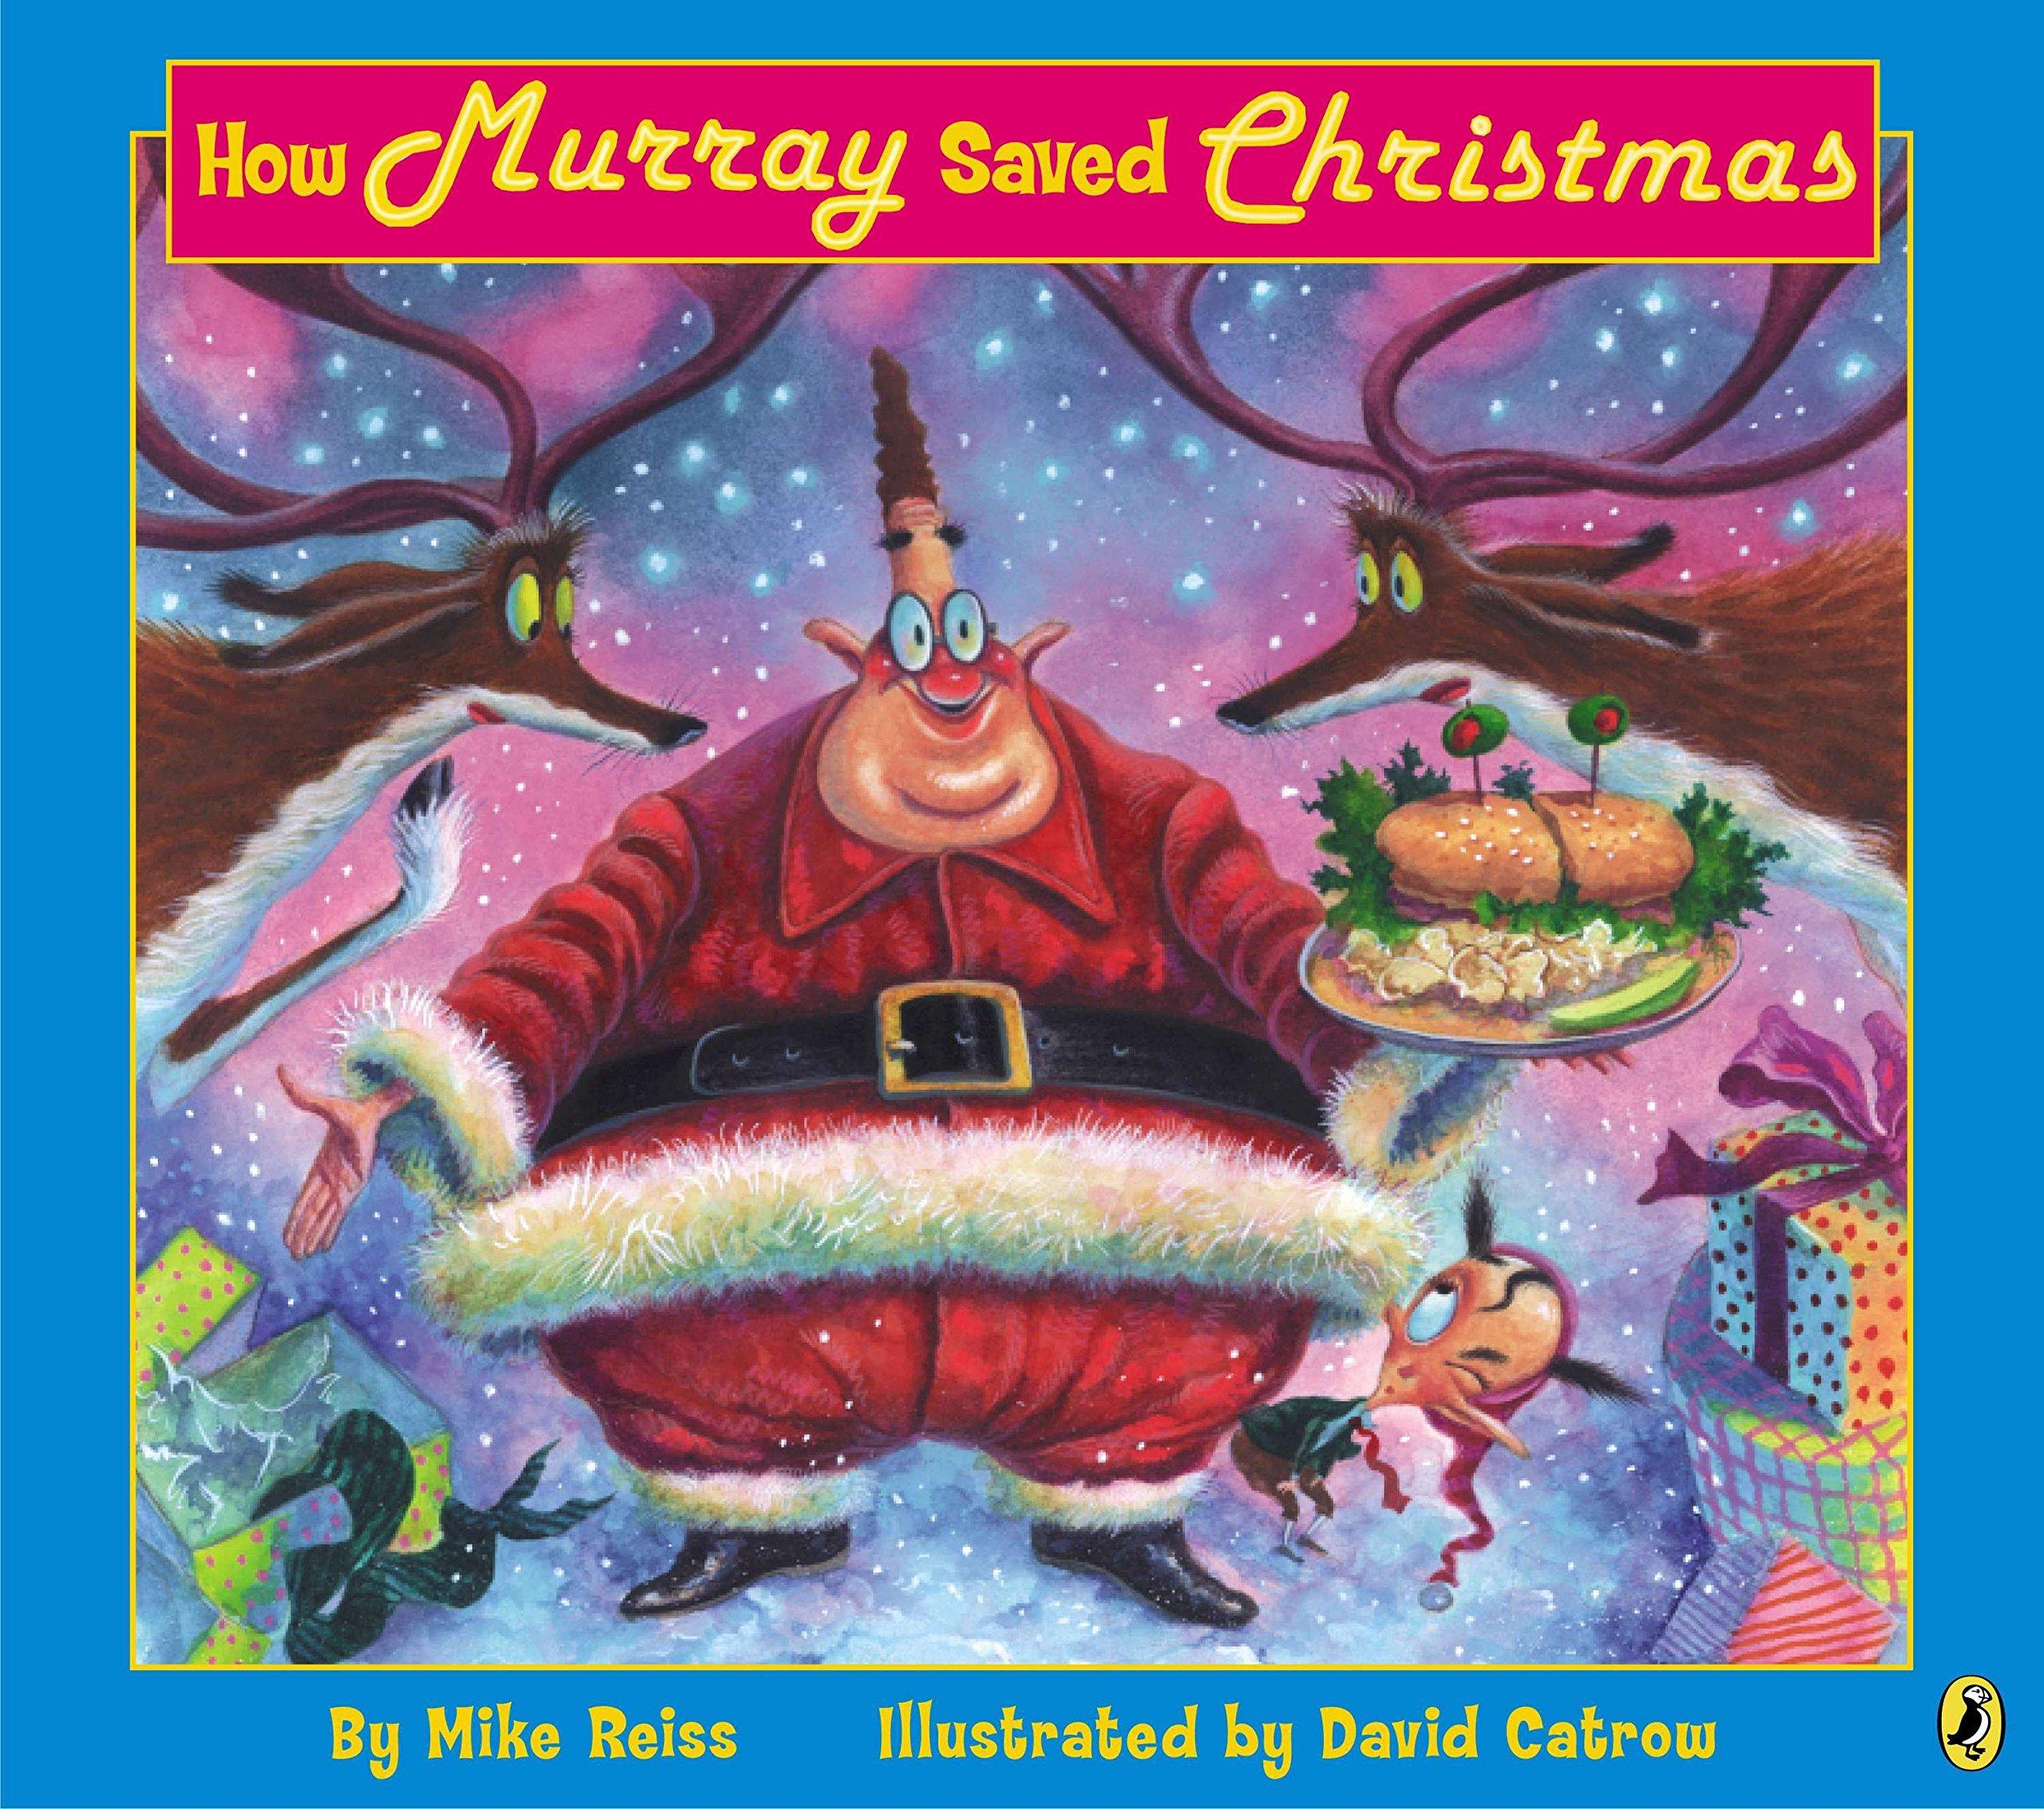 How Murray Saved Christmas.How Murray Saved Christmas Mike Reiss David Catrow